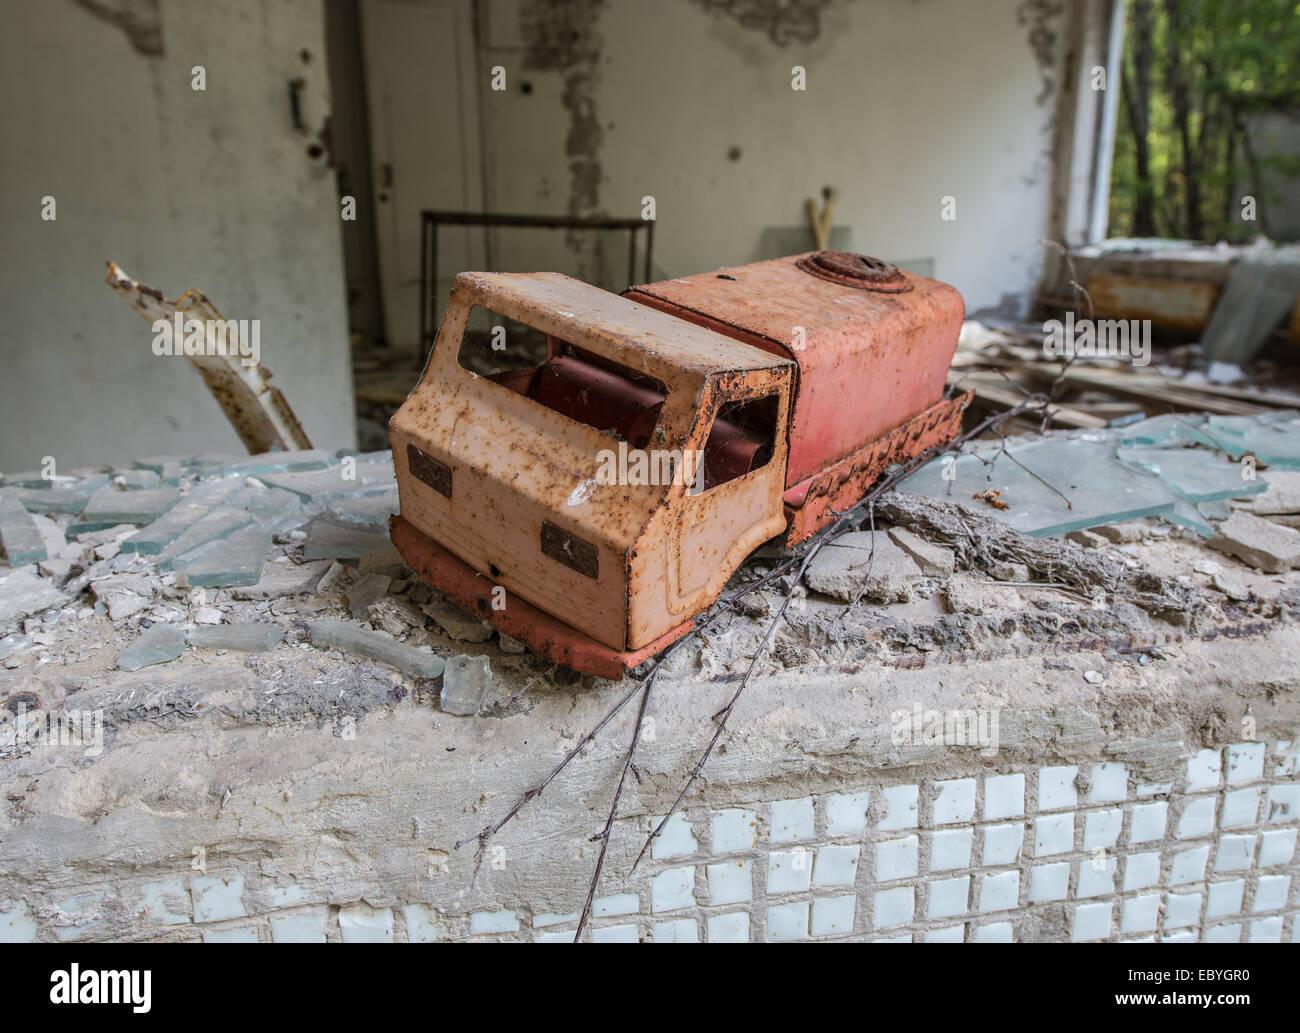 Preventive clinic 'Solnechny' (Sunny) in Pripyat abandoned city, Chernobyl Exclusion Zone, Ukraine - Stock Image